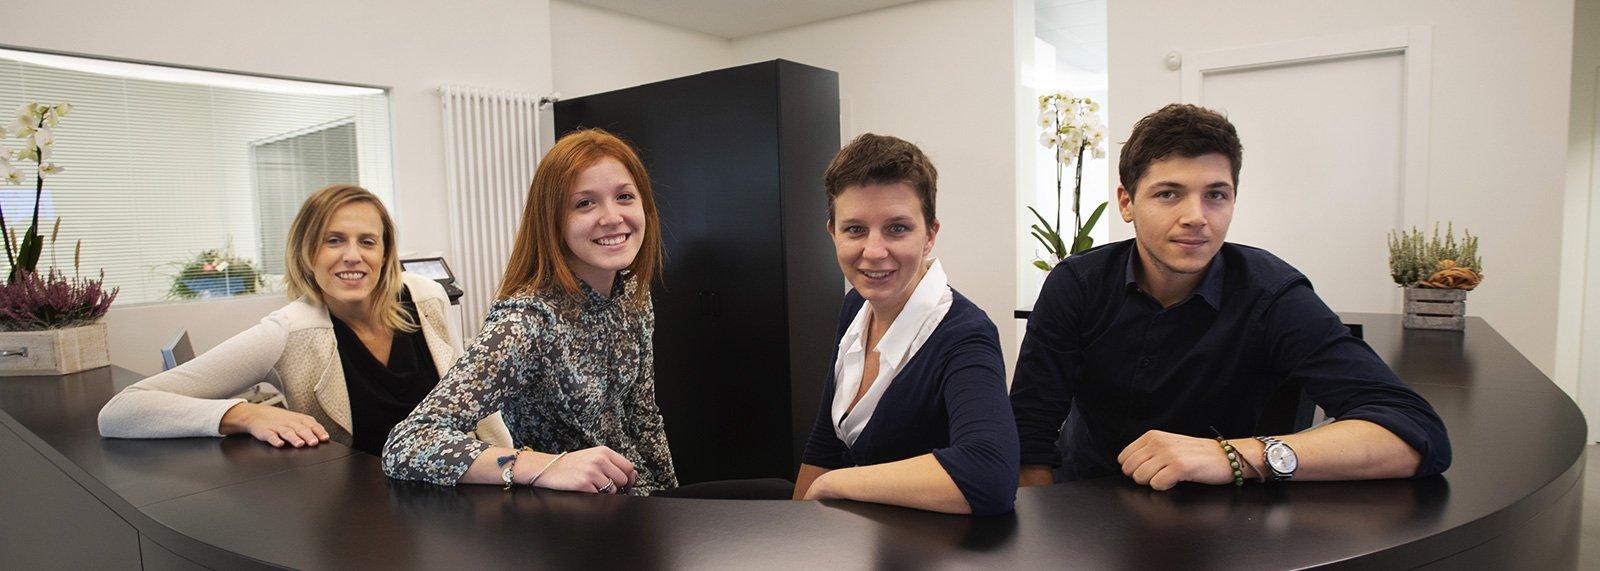 Agenzia Autoteam - Staff